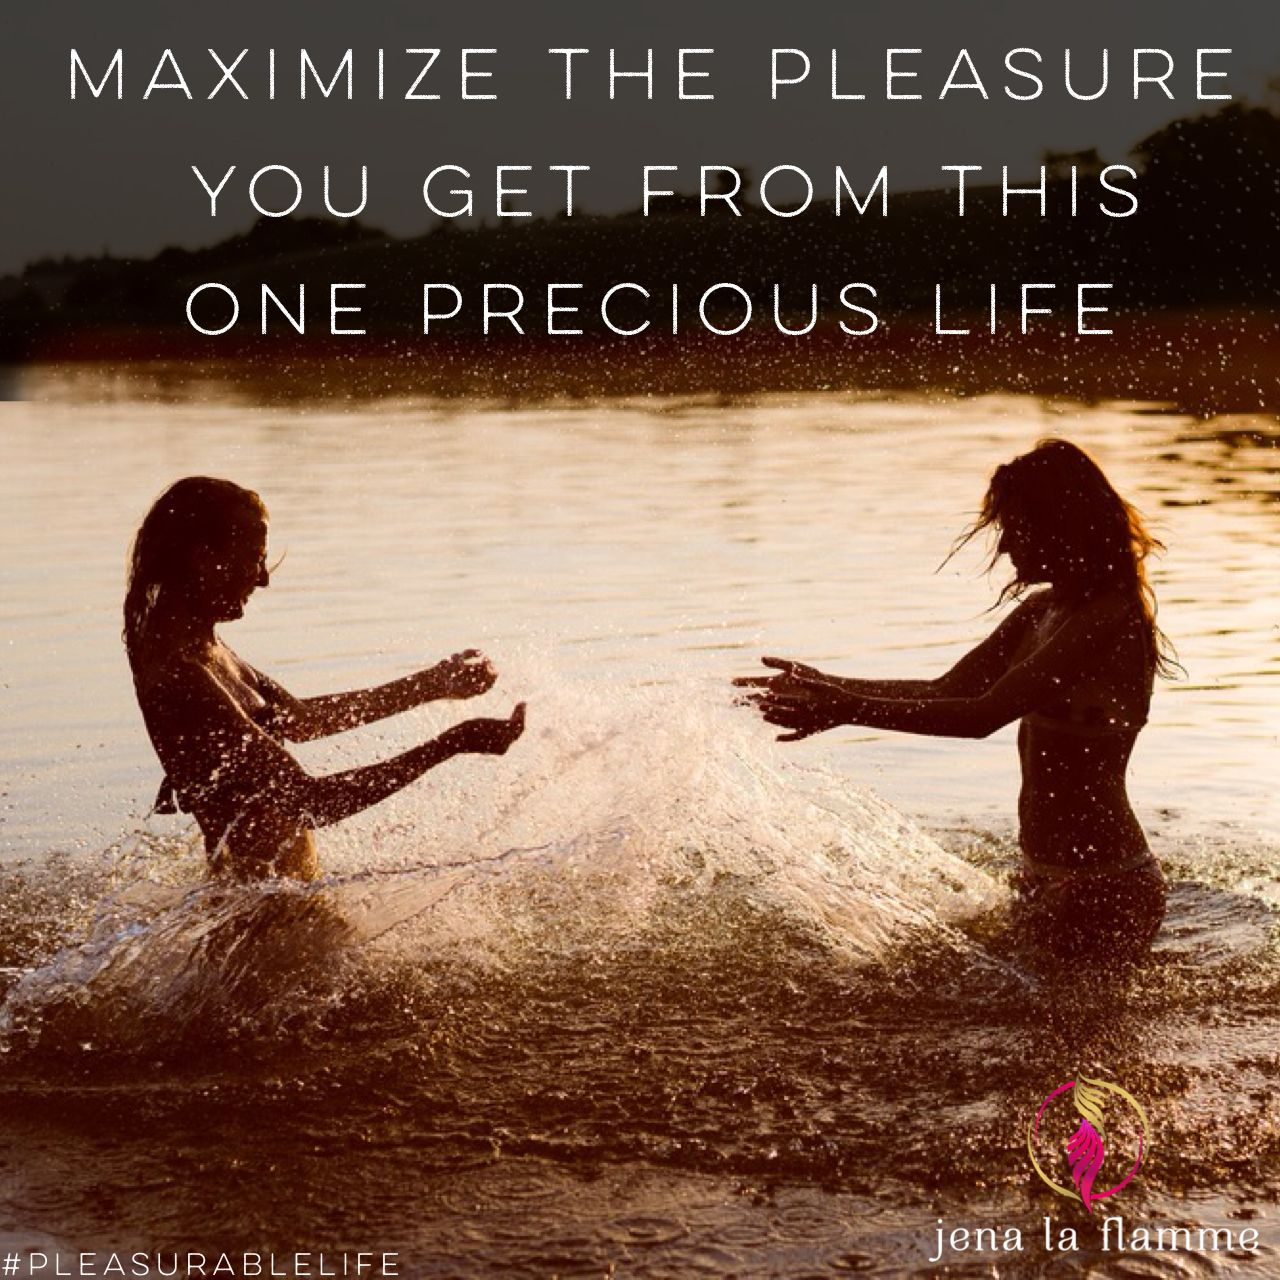 Maximize the pleasure you get from this one precious life.   #jenalaflamme #pleasurableweightloss #pleasurerevolution